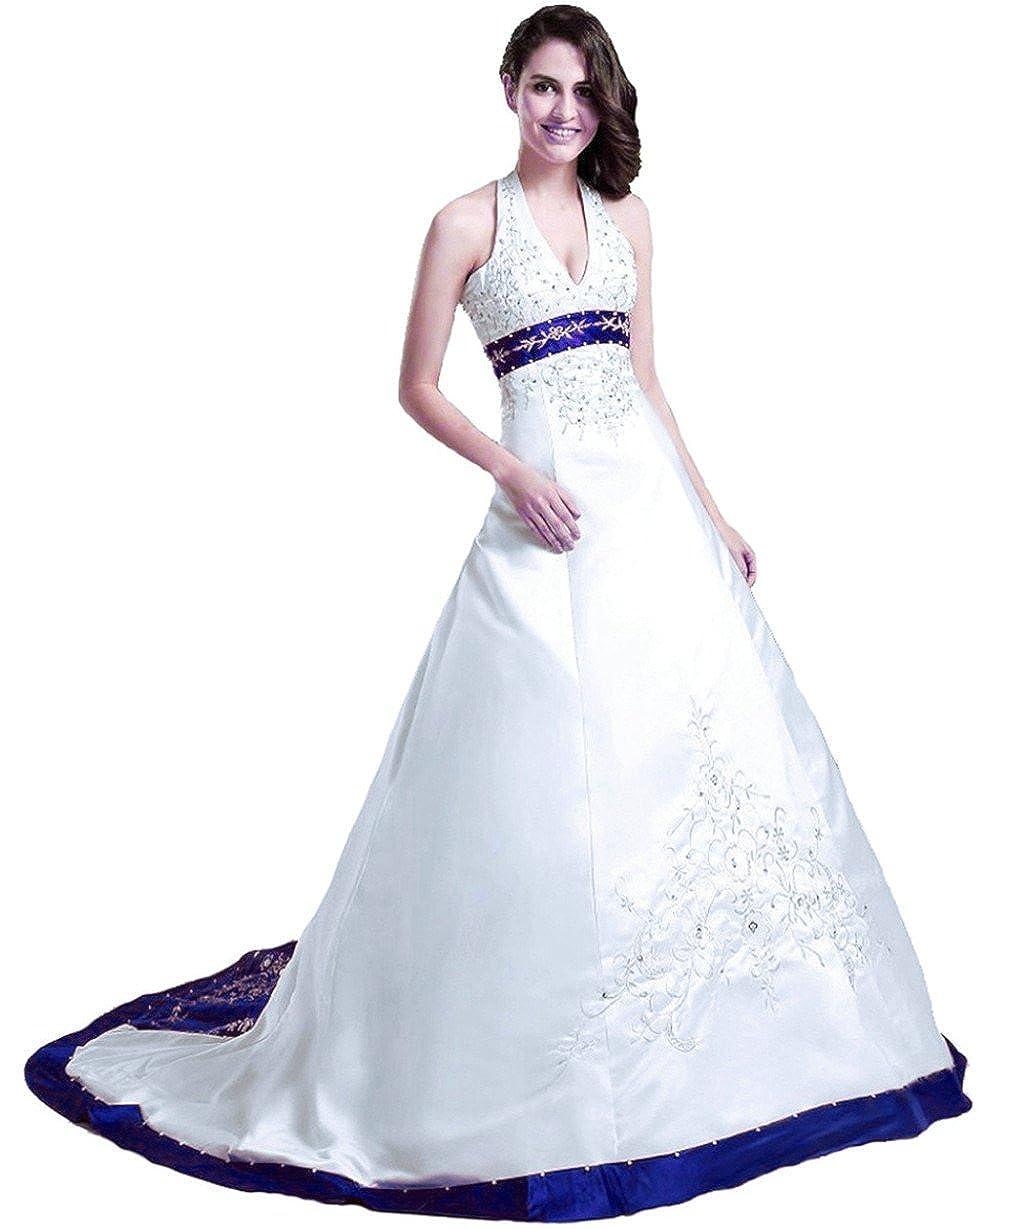 White bluee Vantexi Women's Halter Neckline Satin Embroidery Bridal Wedding Dresses